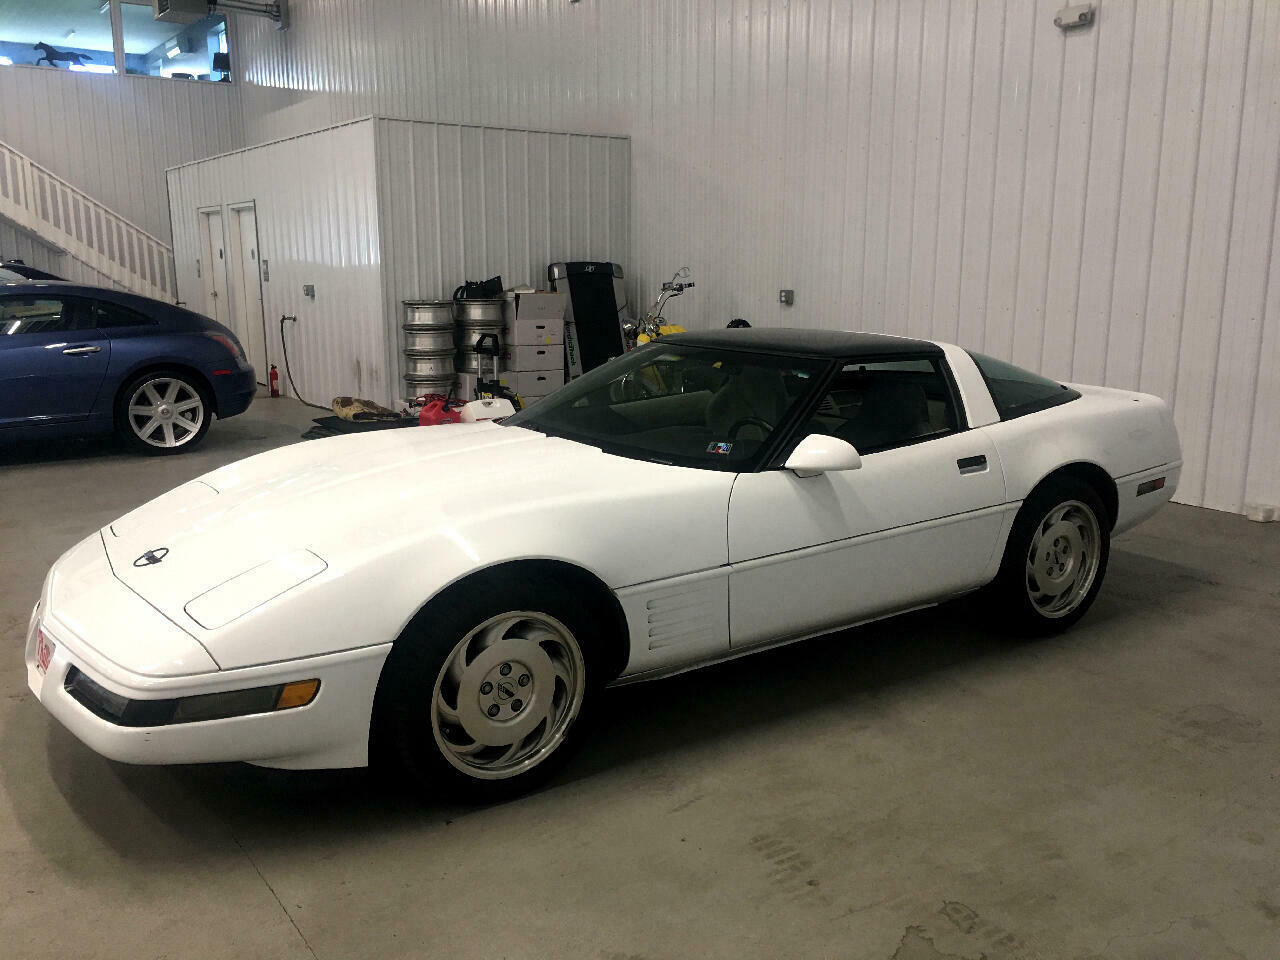 1994 White Chevrolet Corvette Coupe    C4 Corvette Photo 5